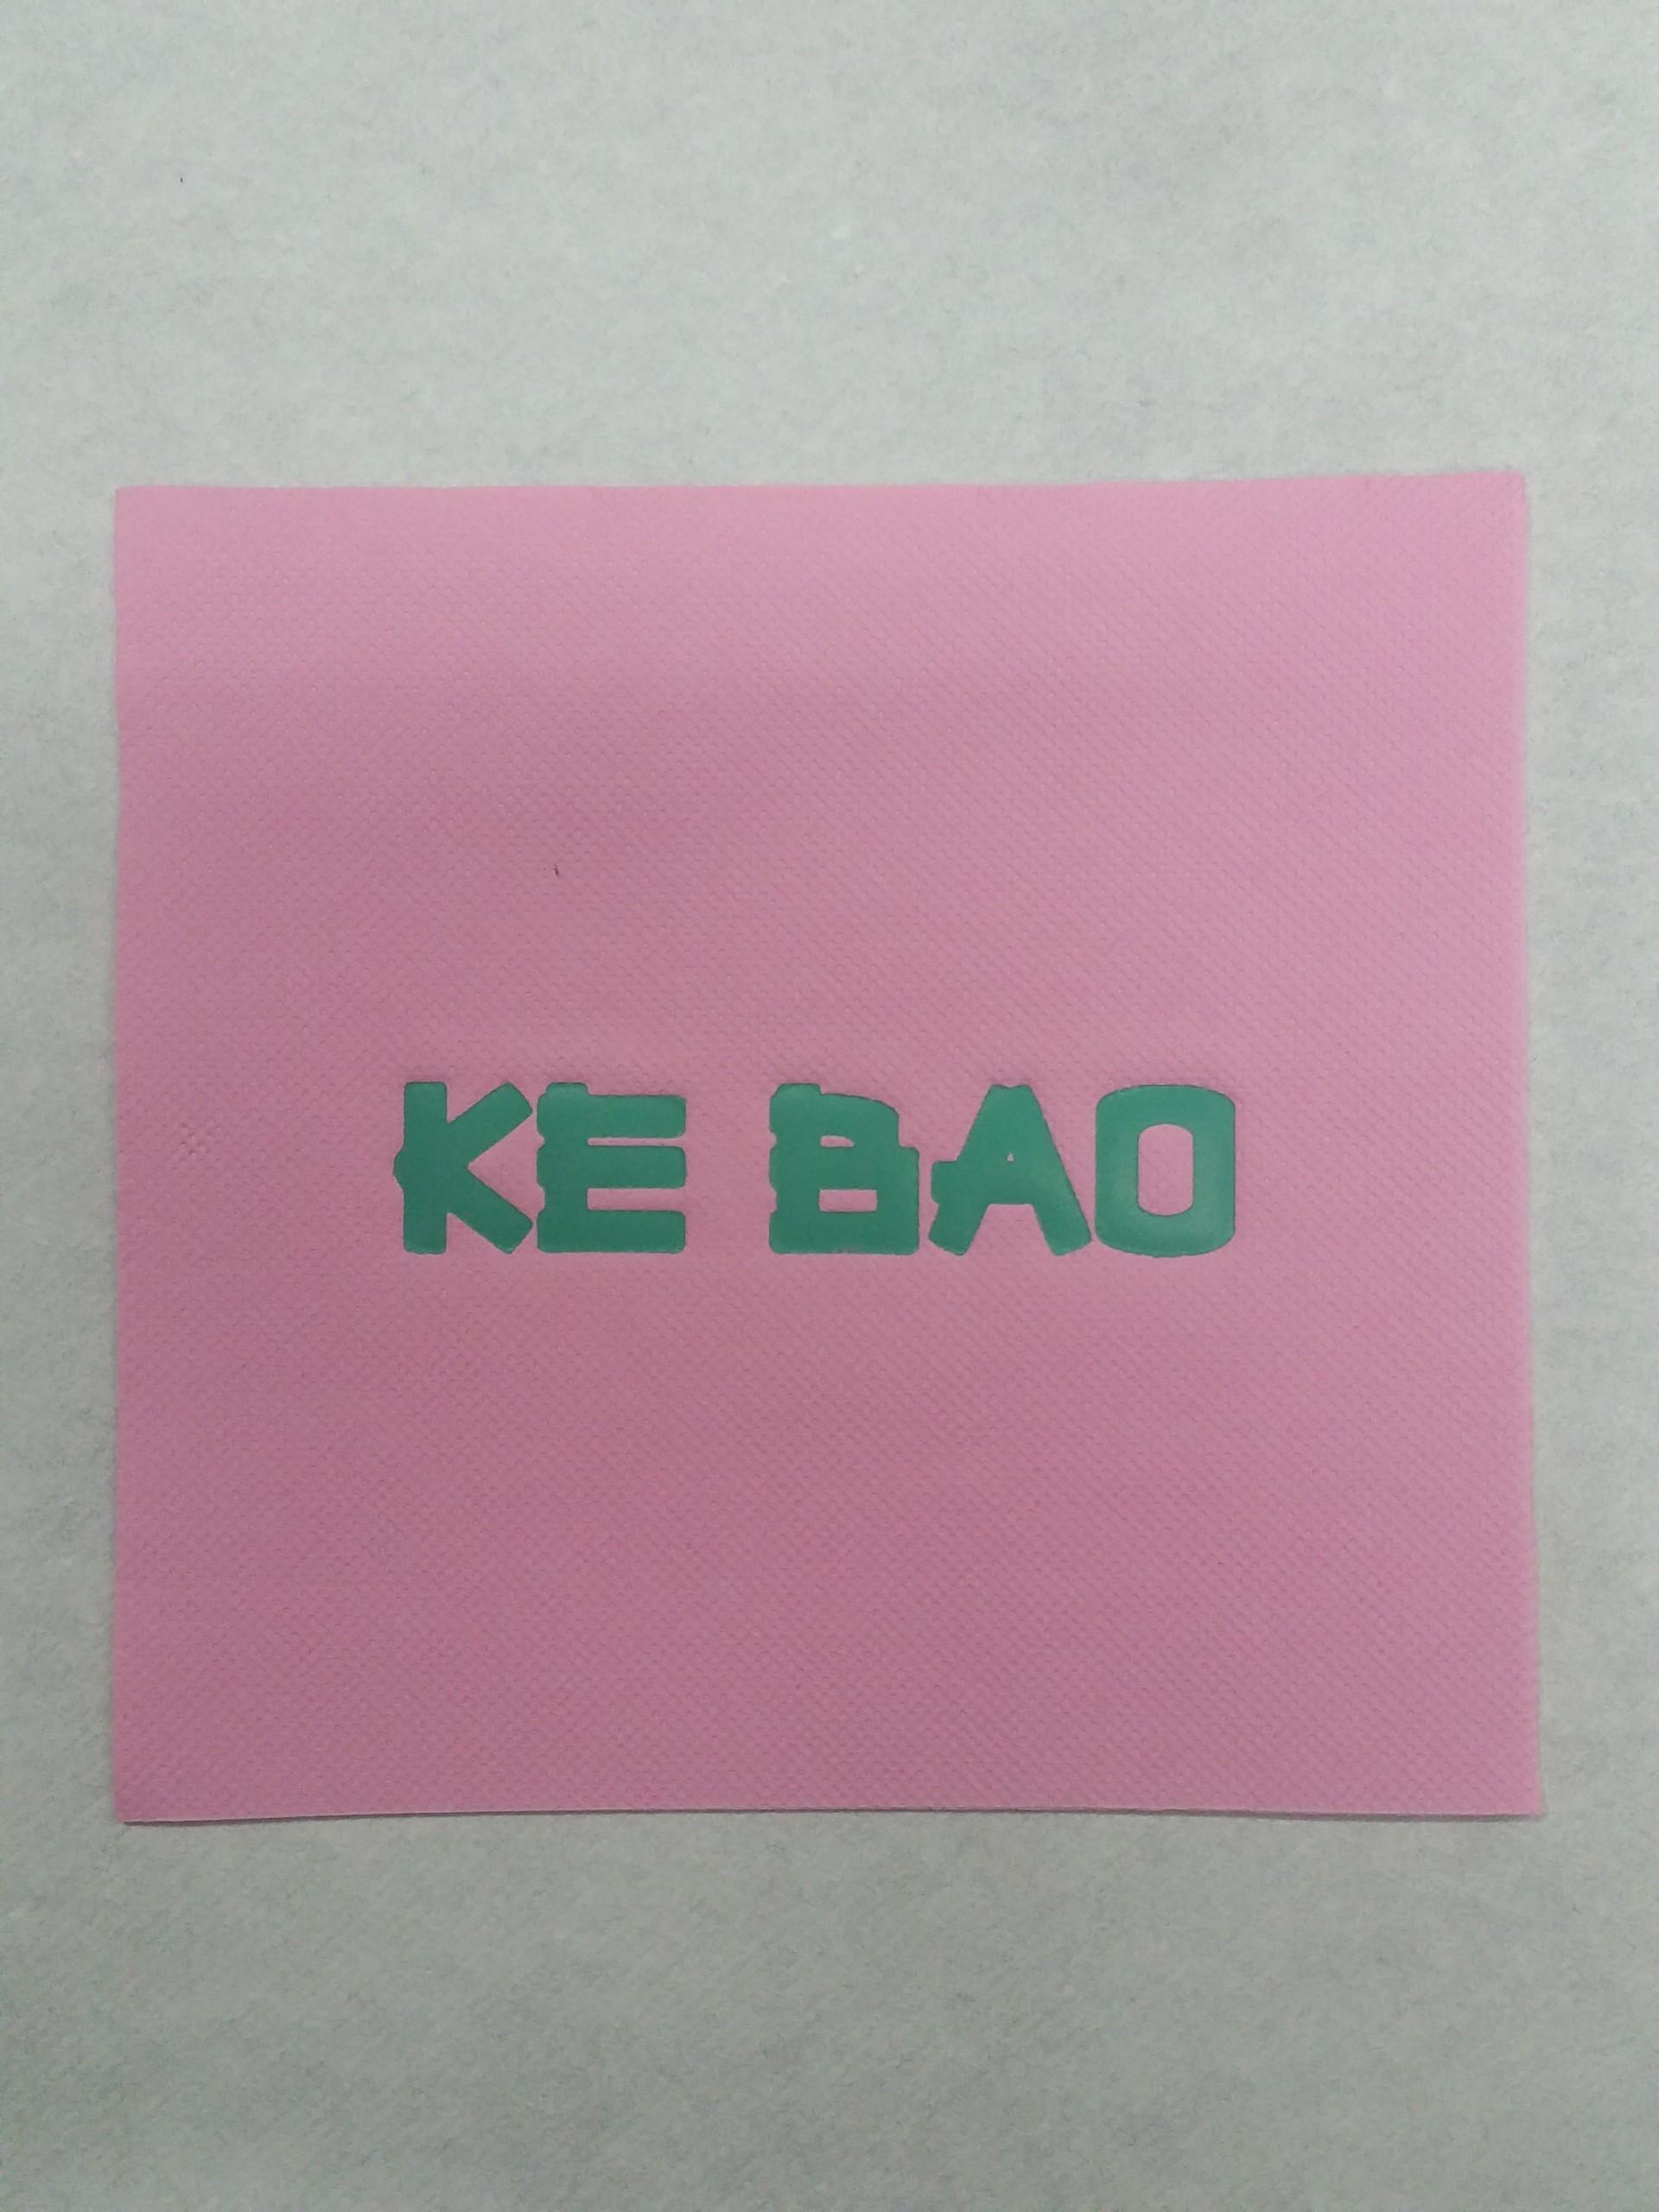 Servilleta Personalizada Ke bao